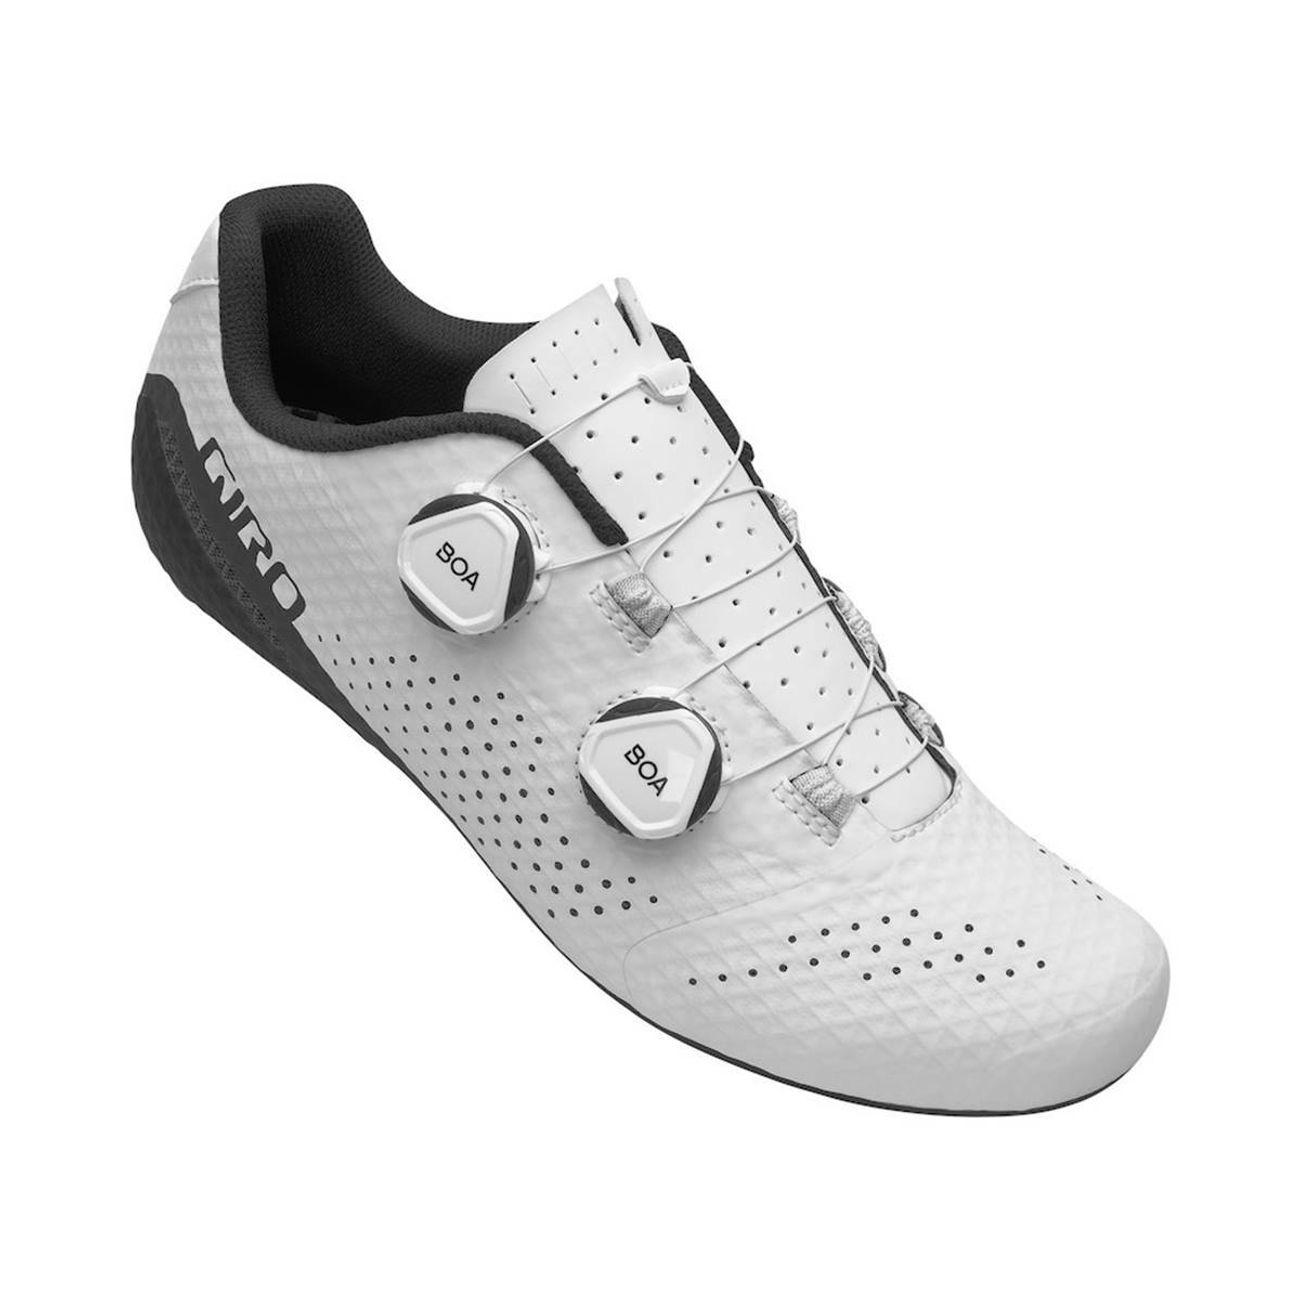 Cyclisme sur route homme GIRO Chaussures Giro Regime